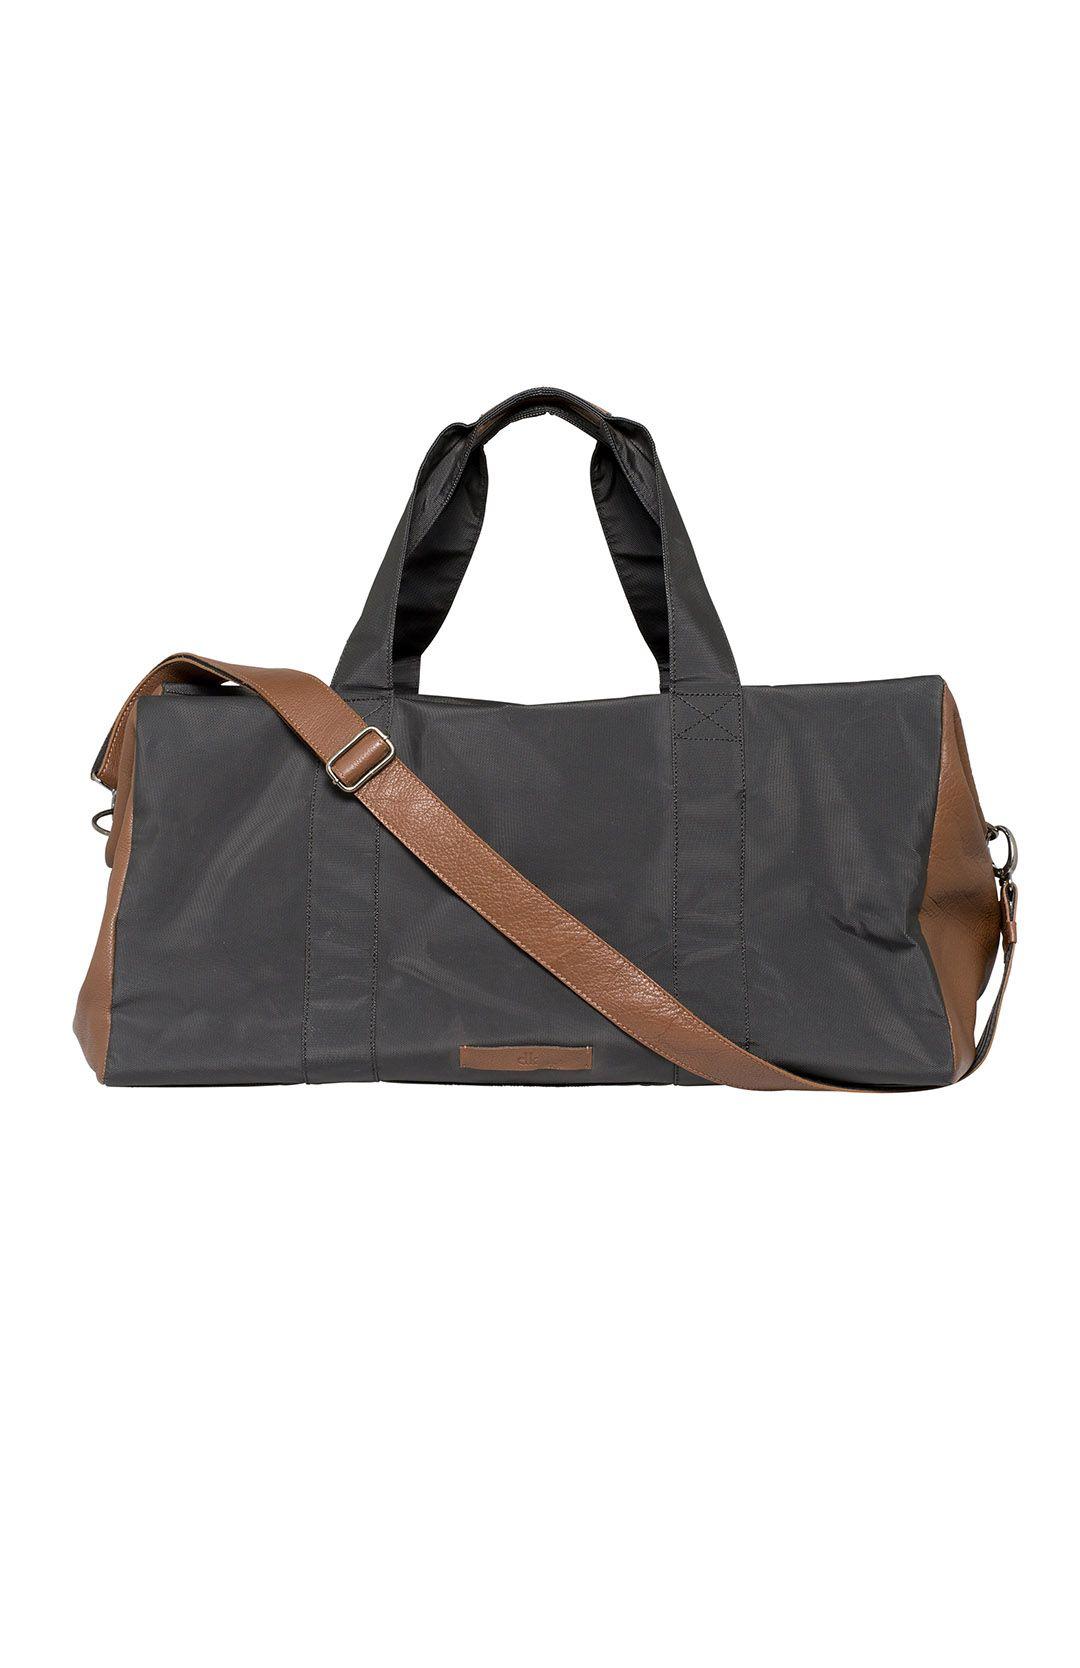 Elk accessories larvik overnight bag bags overnight bag